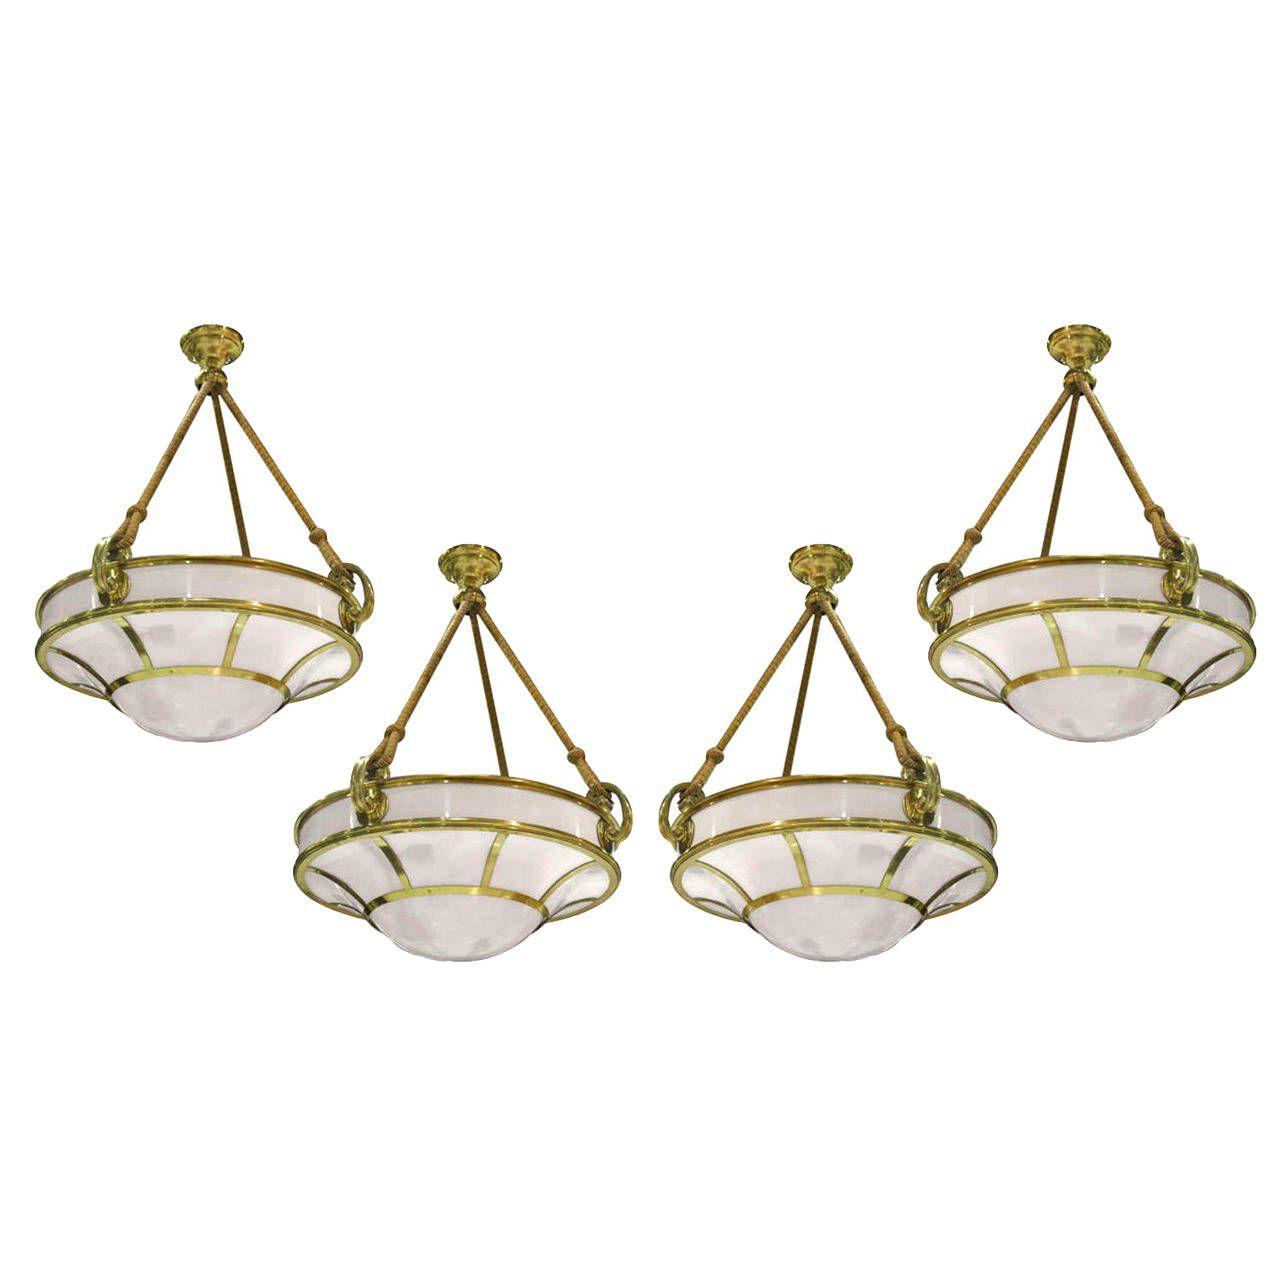 Set of four pendant lights pendant lighting large pendant